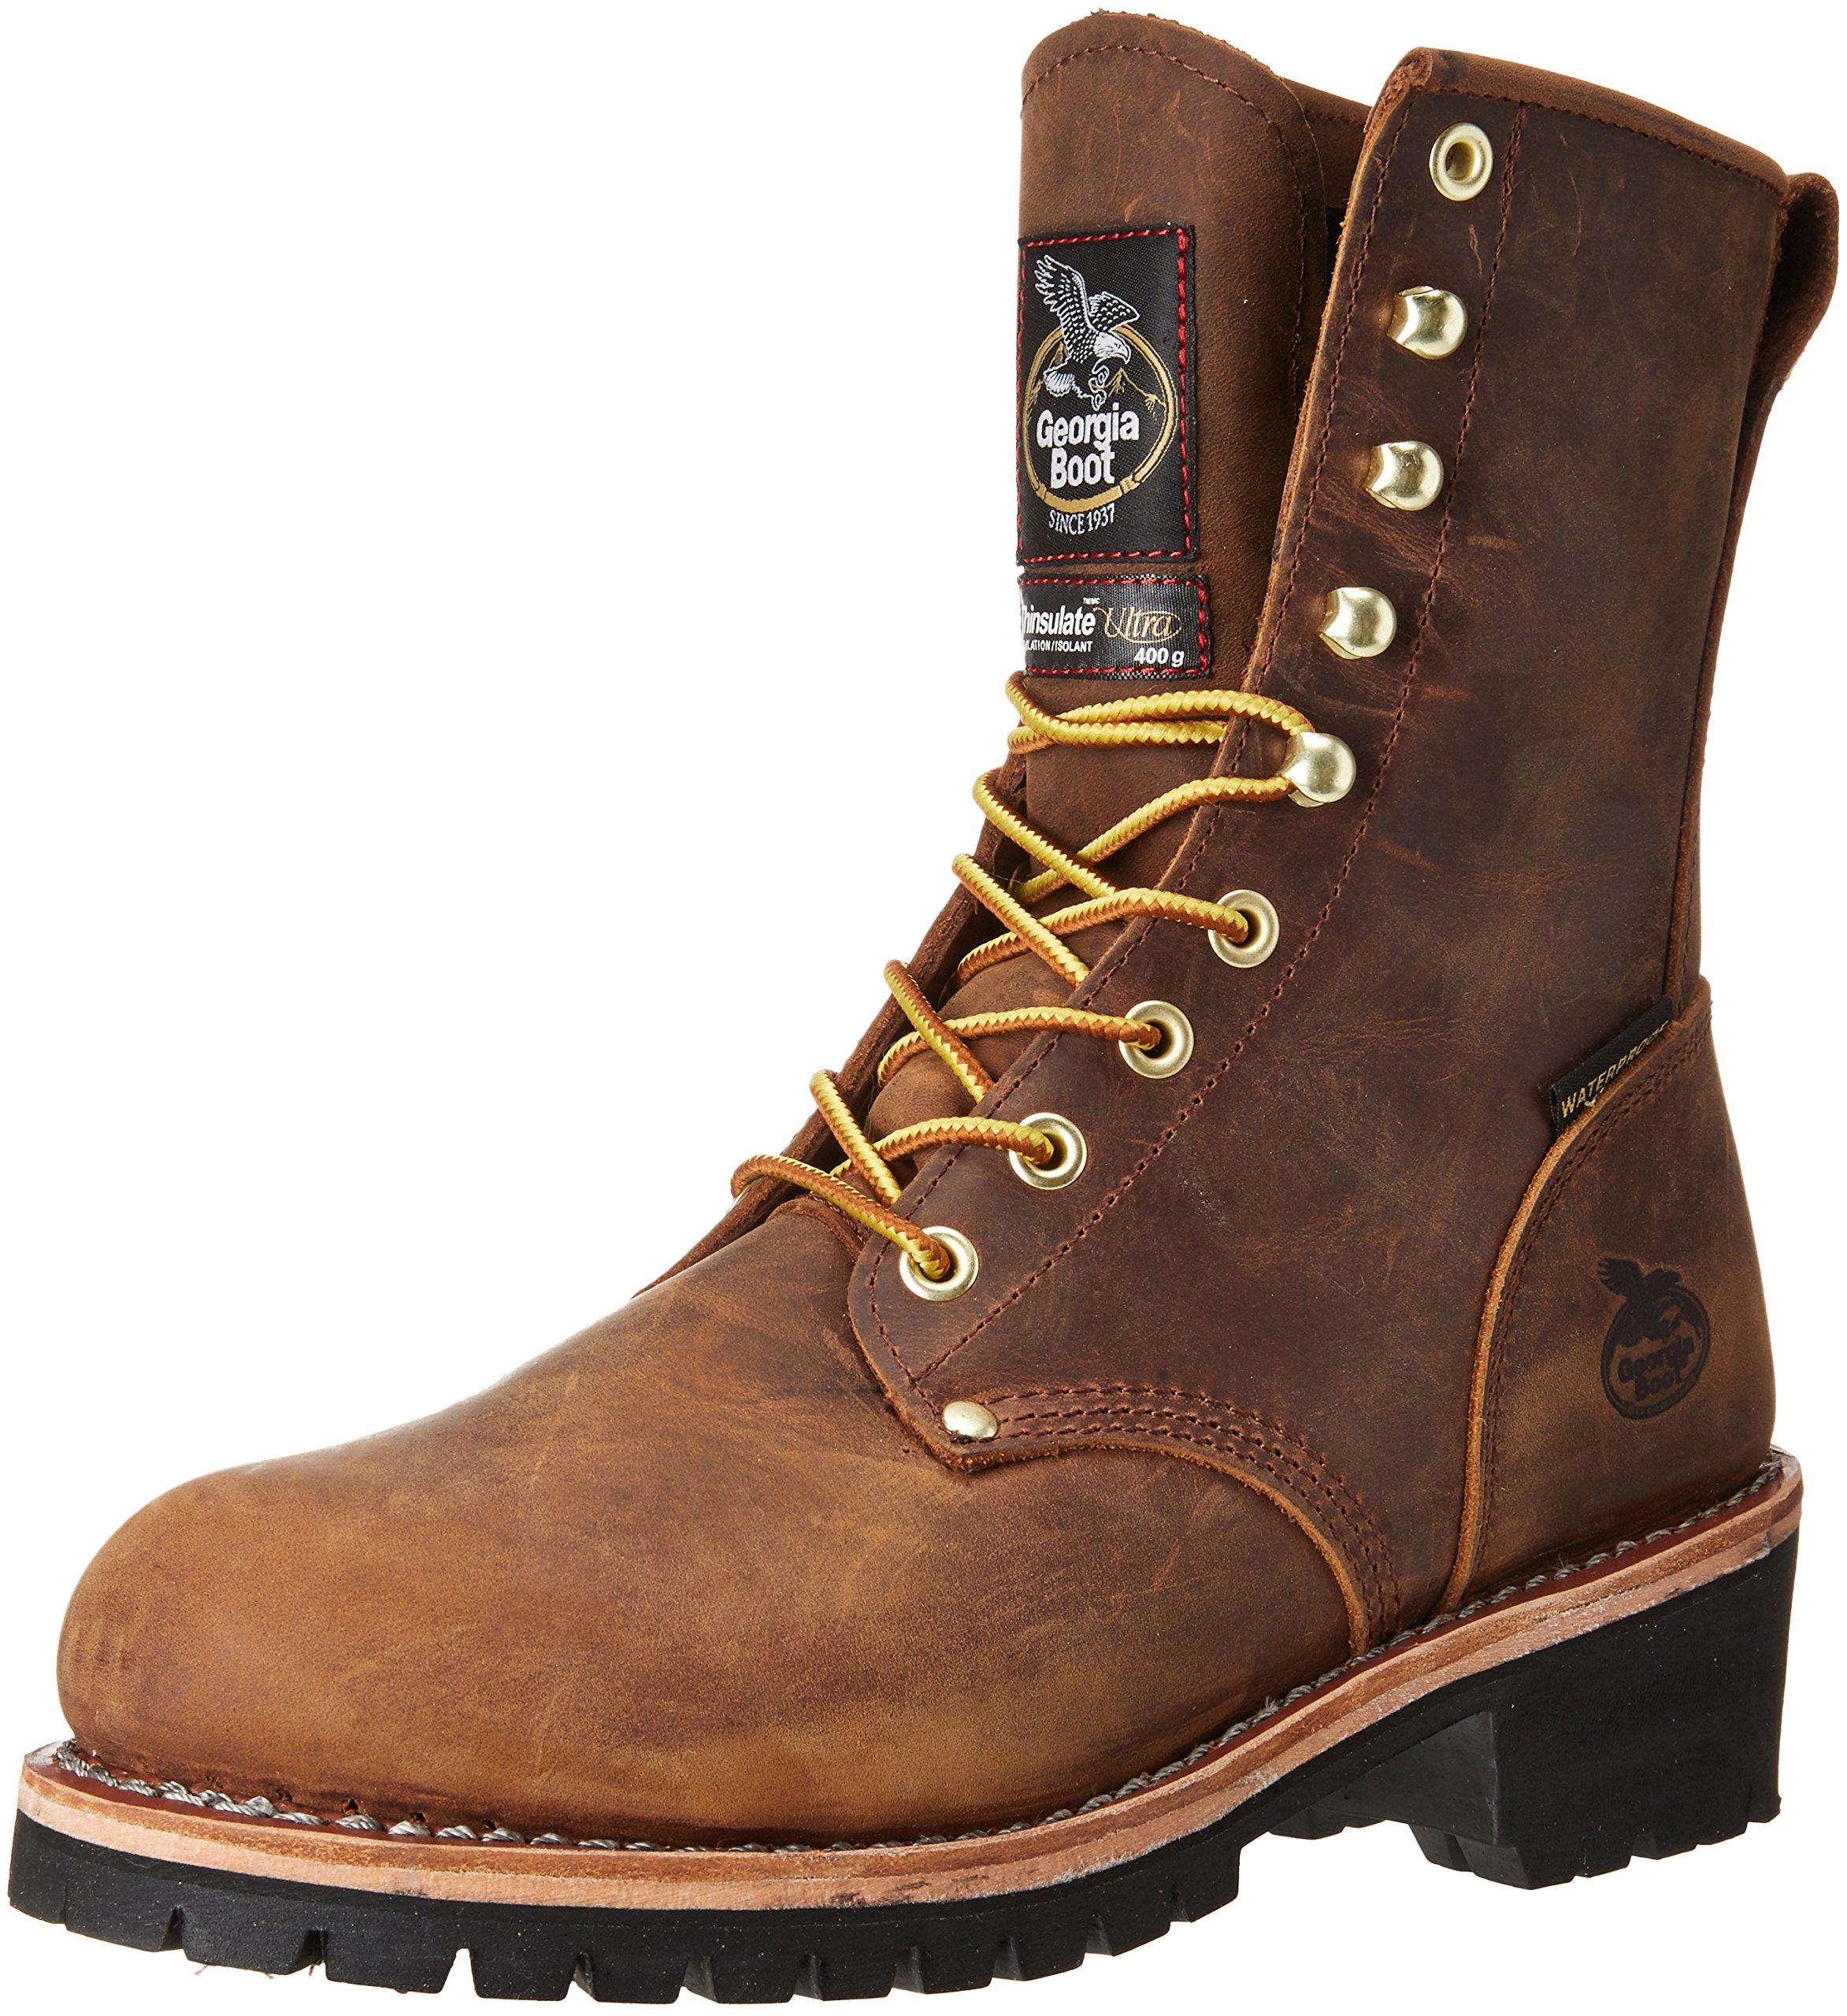 Georgia GB00065 Mid Calf Boot, Brown, 12 M US